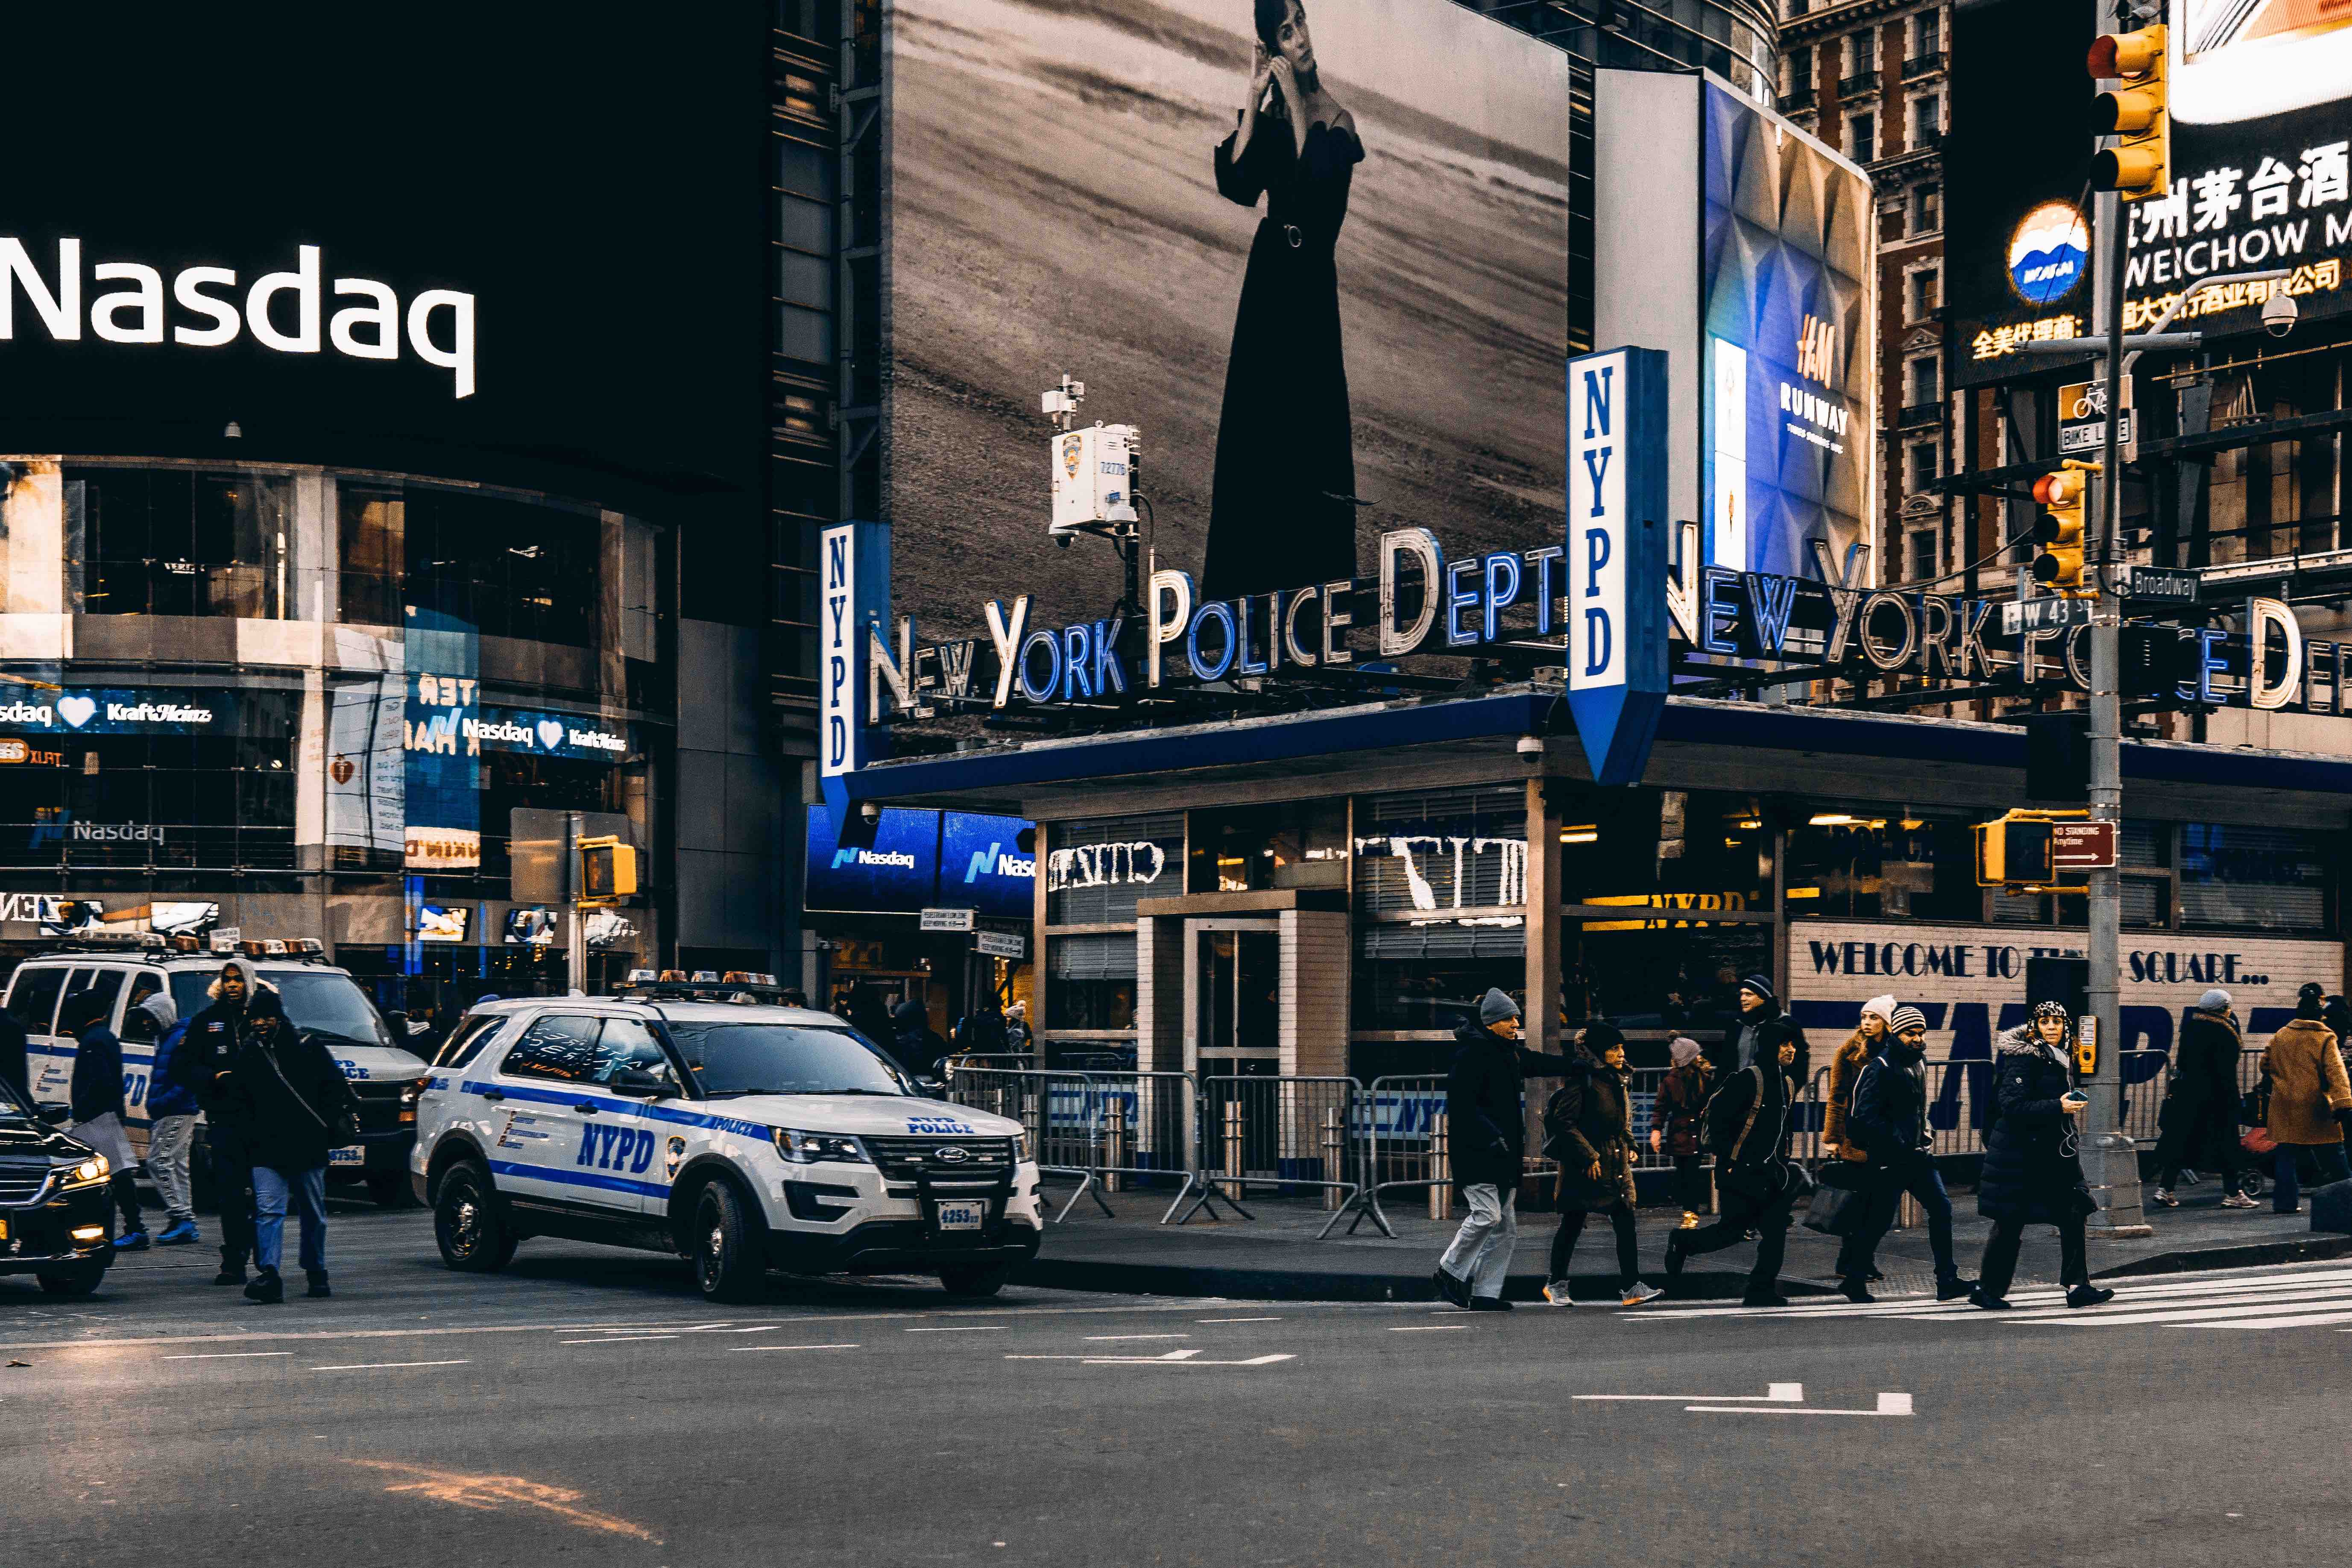 Nasdaq in New York